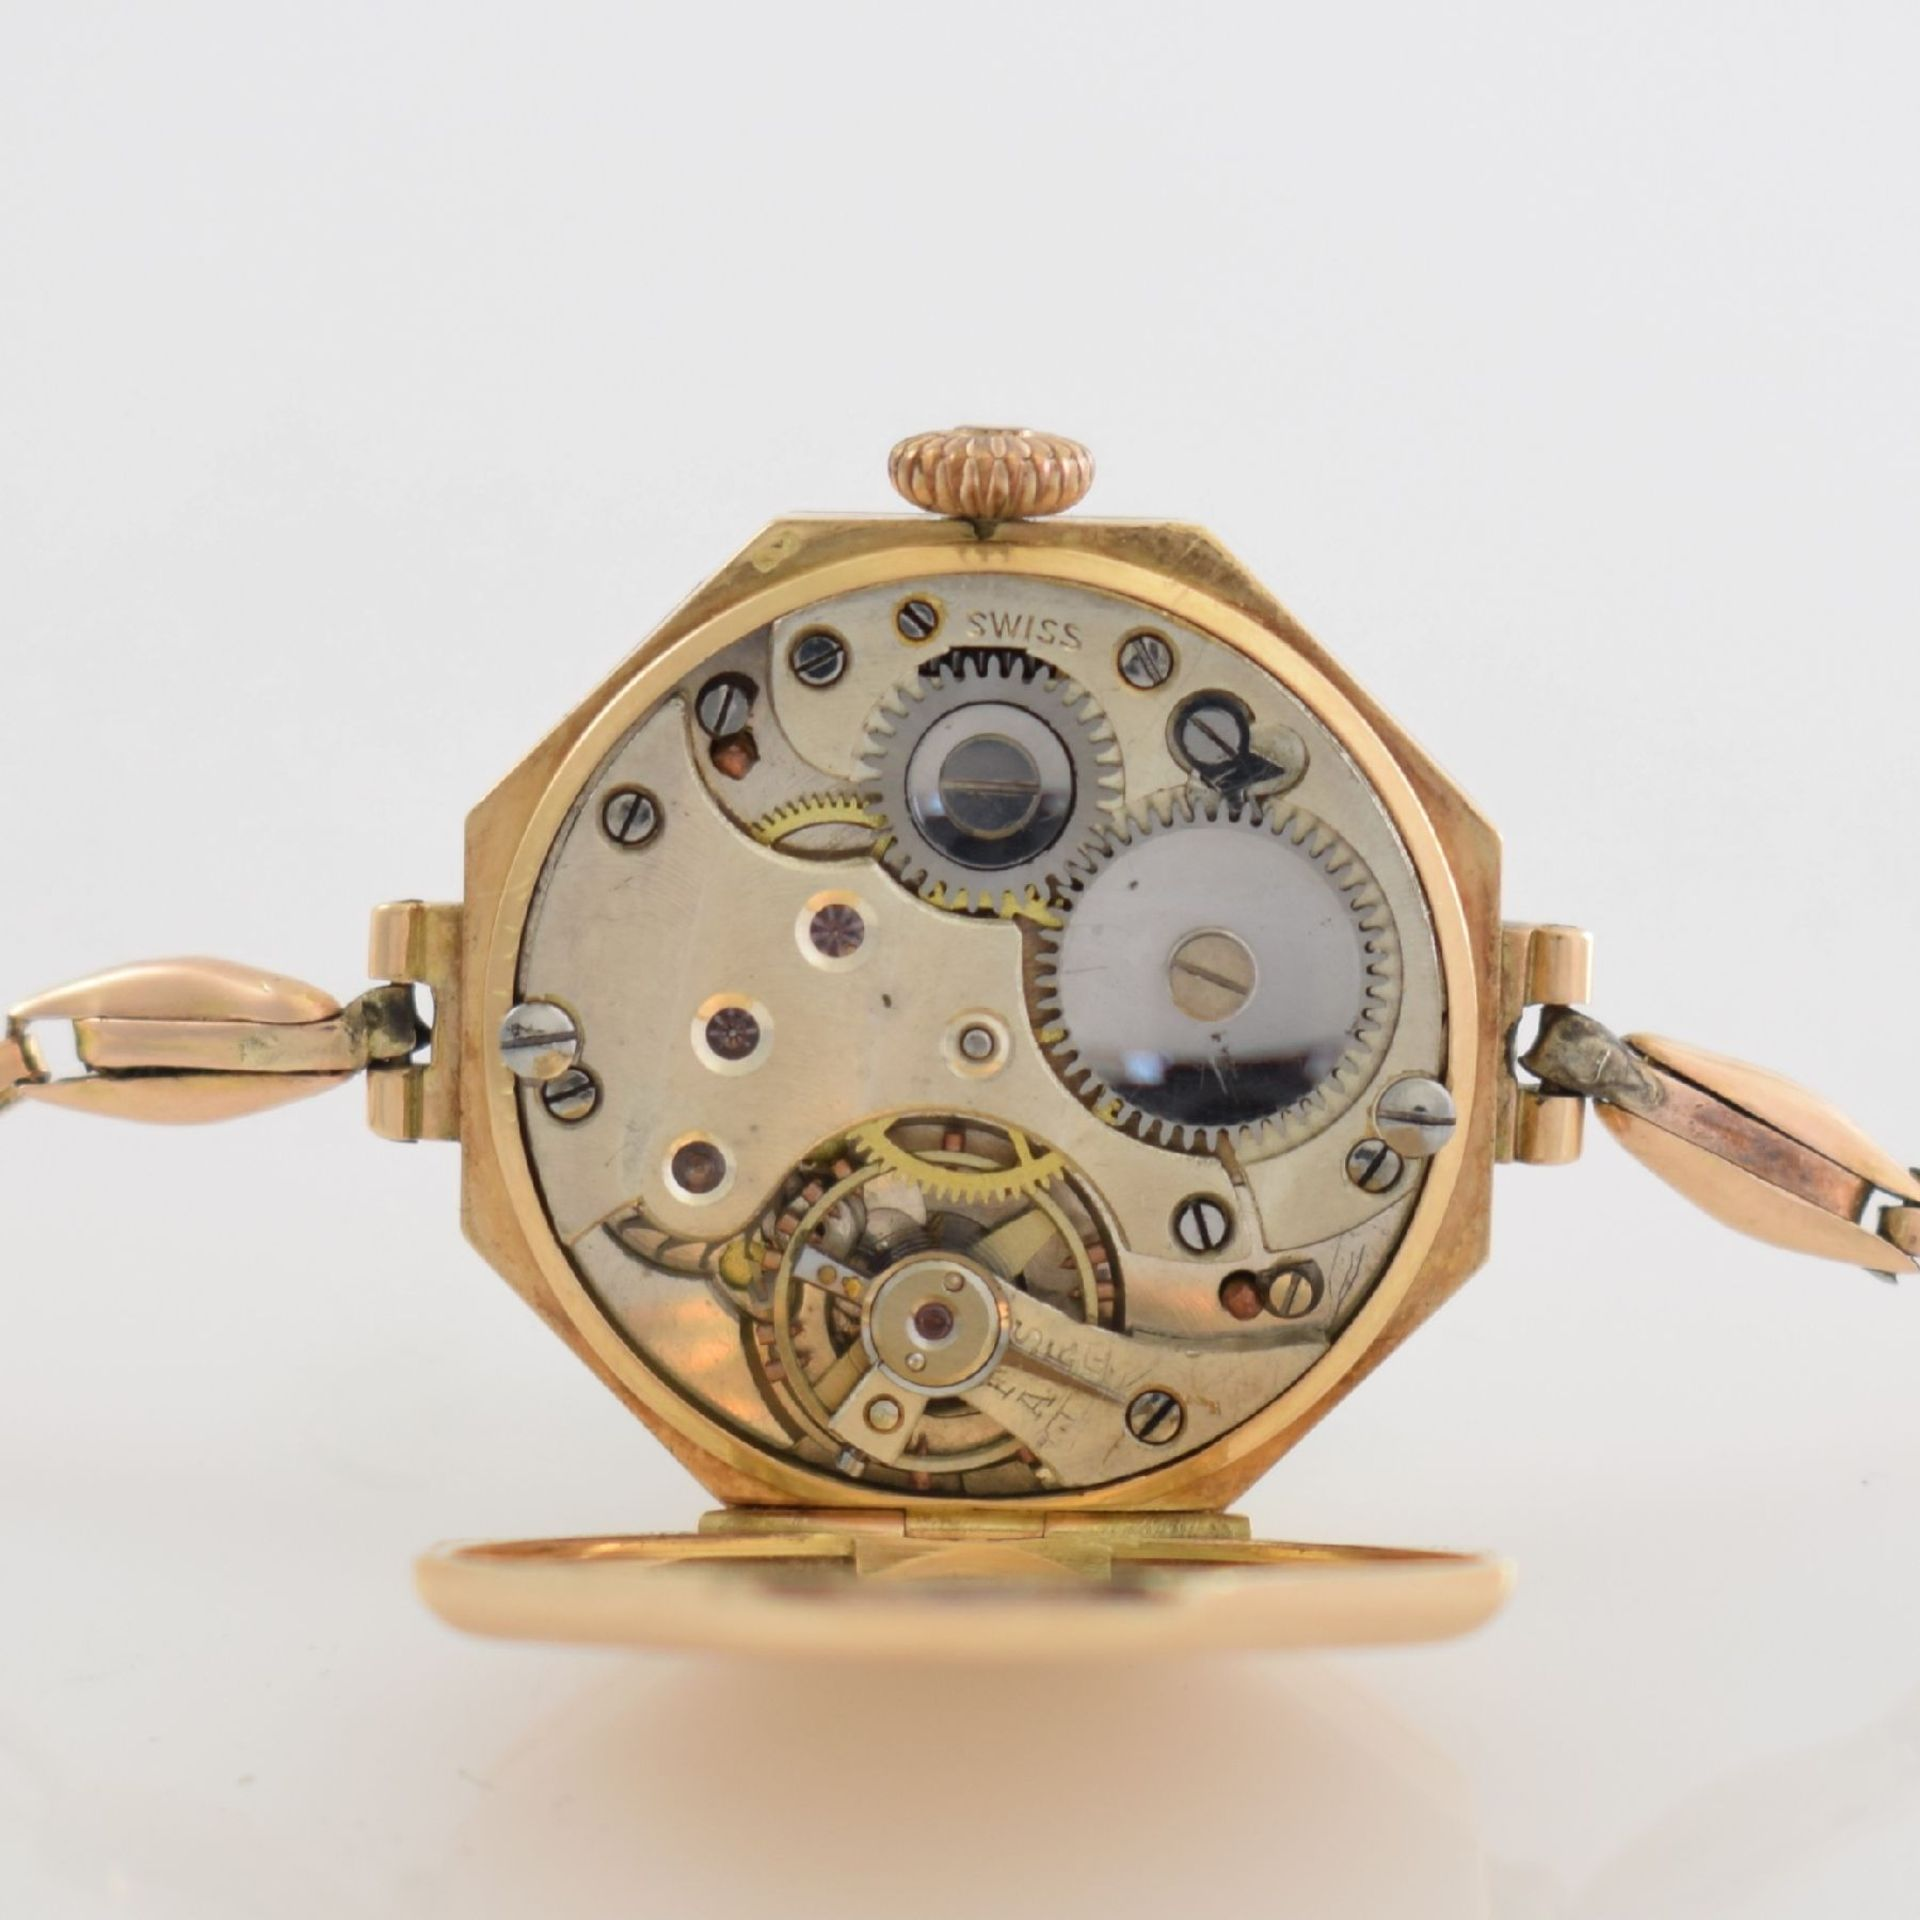 Frühe oktogonale Damenarmbanduhr in RoseG 585/000, Schweiz um 1925, Handaufzug, gedr. - Bild 4 aus 4